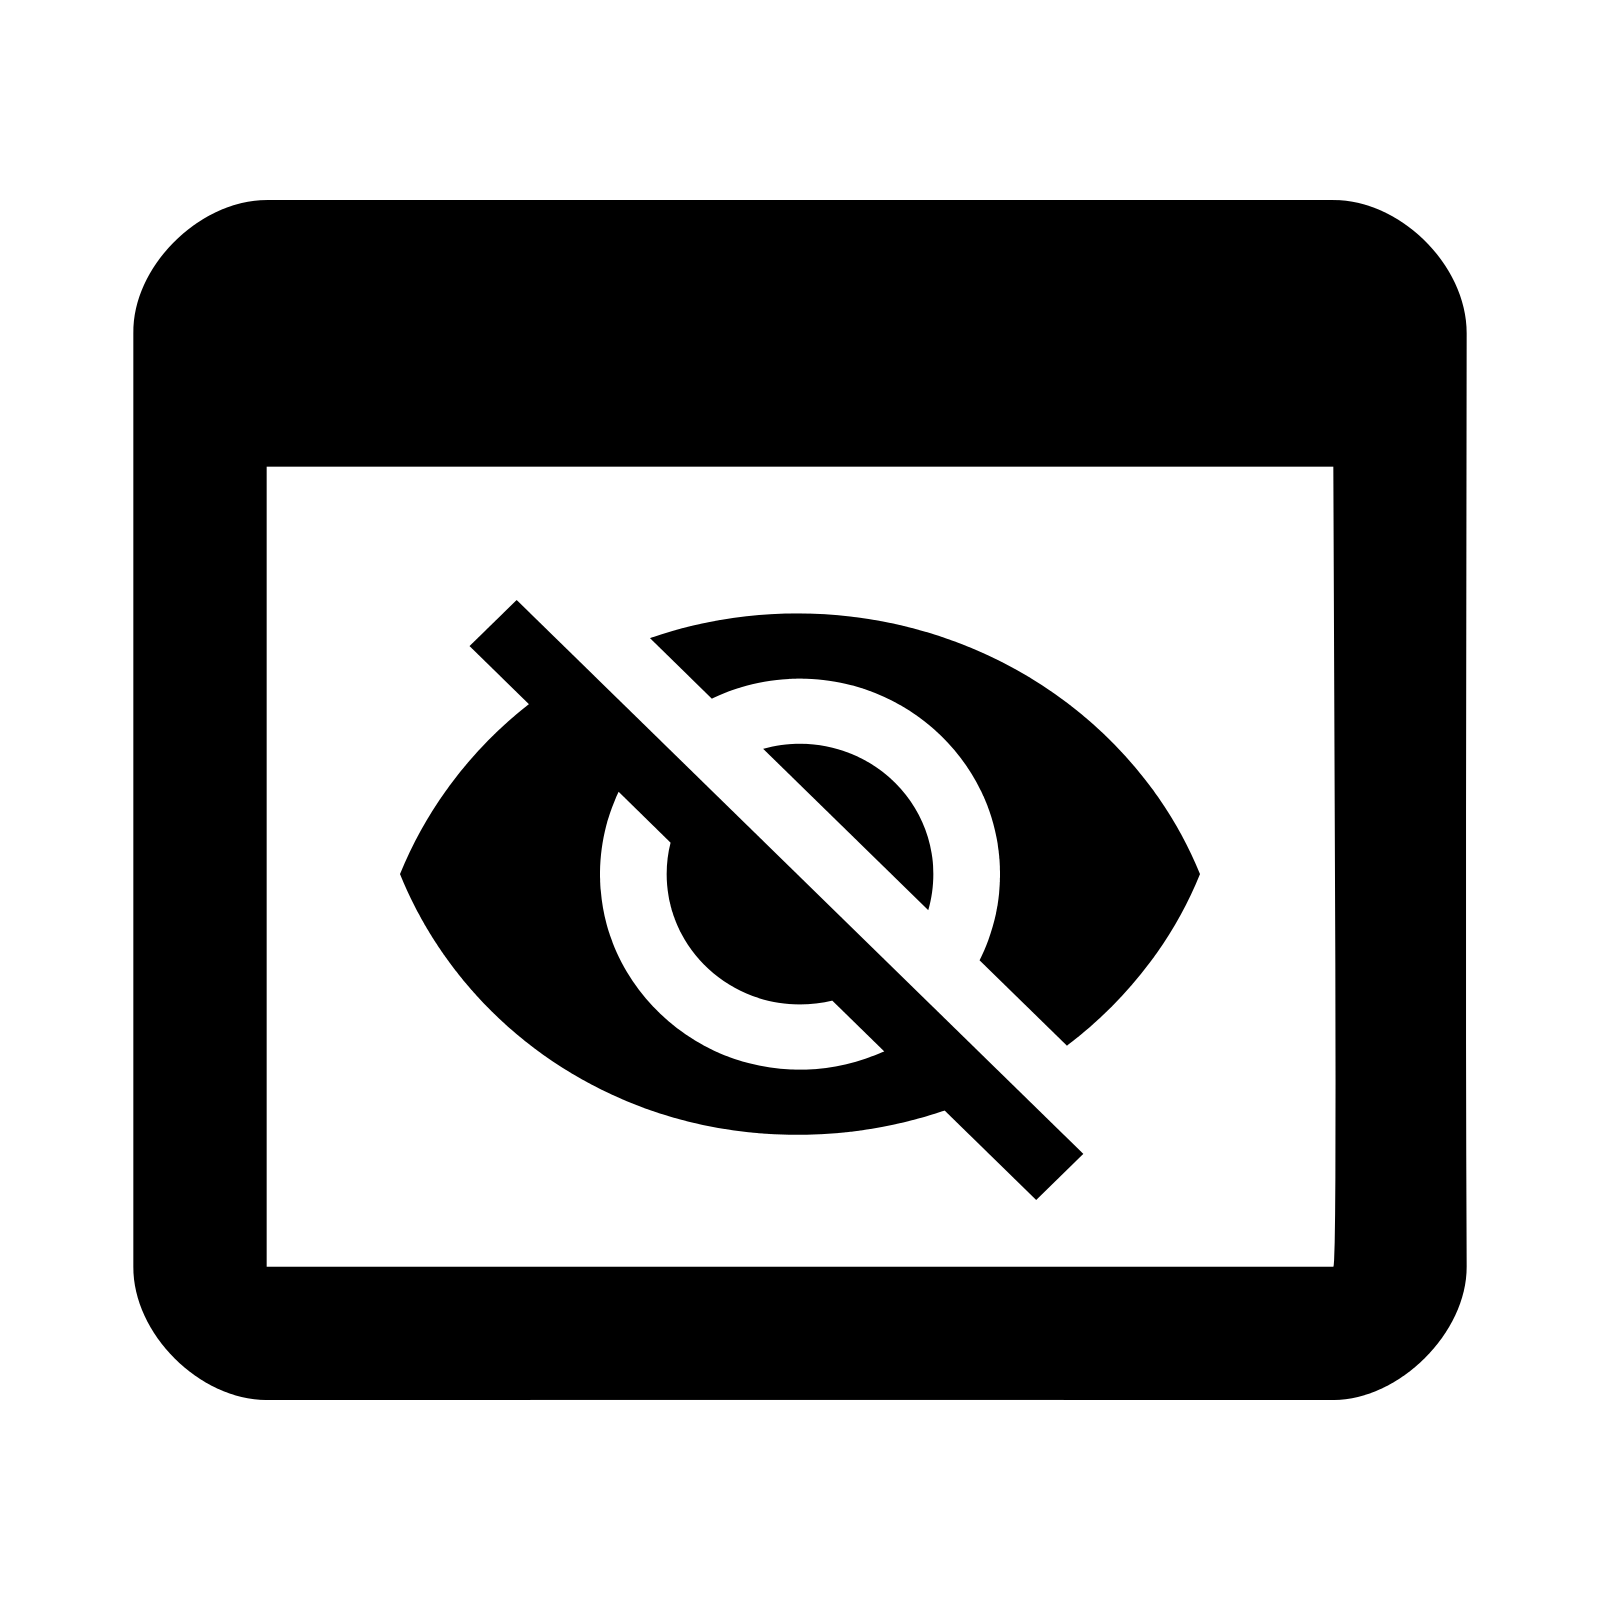 Mark View As Hidden Icon - Hidden, Transparent background PNG HD thumbnail